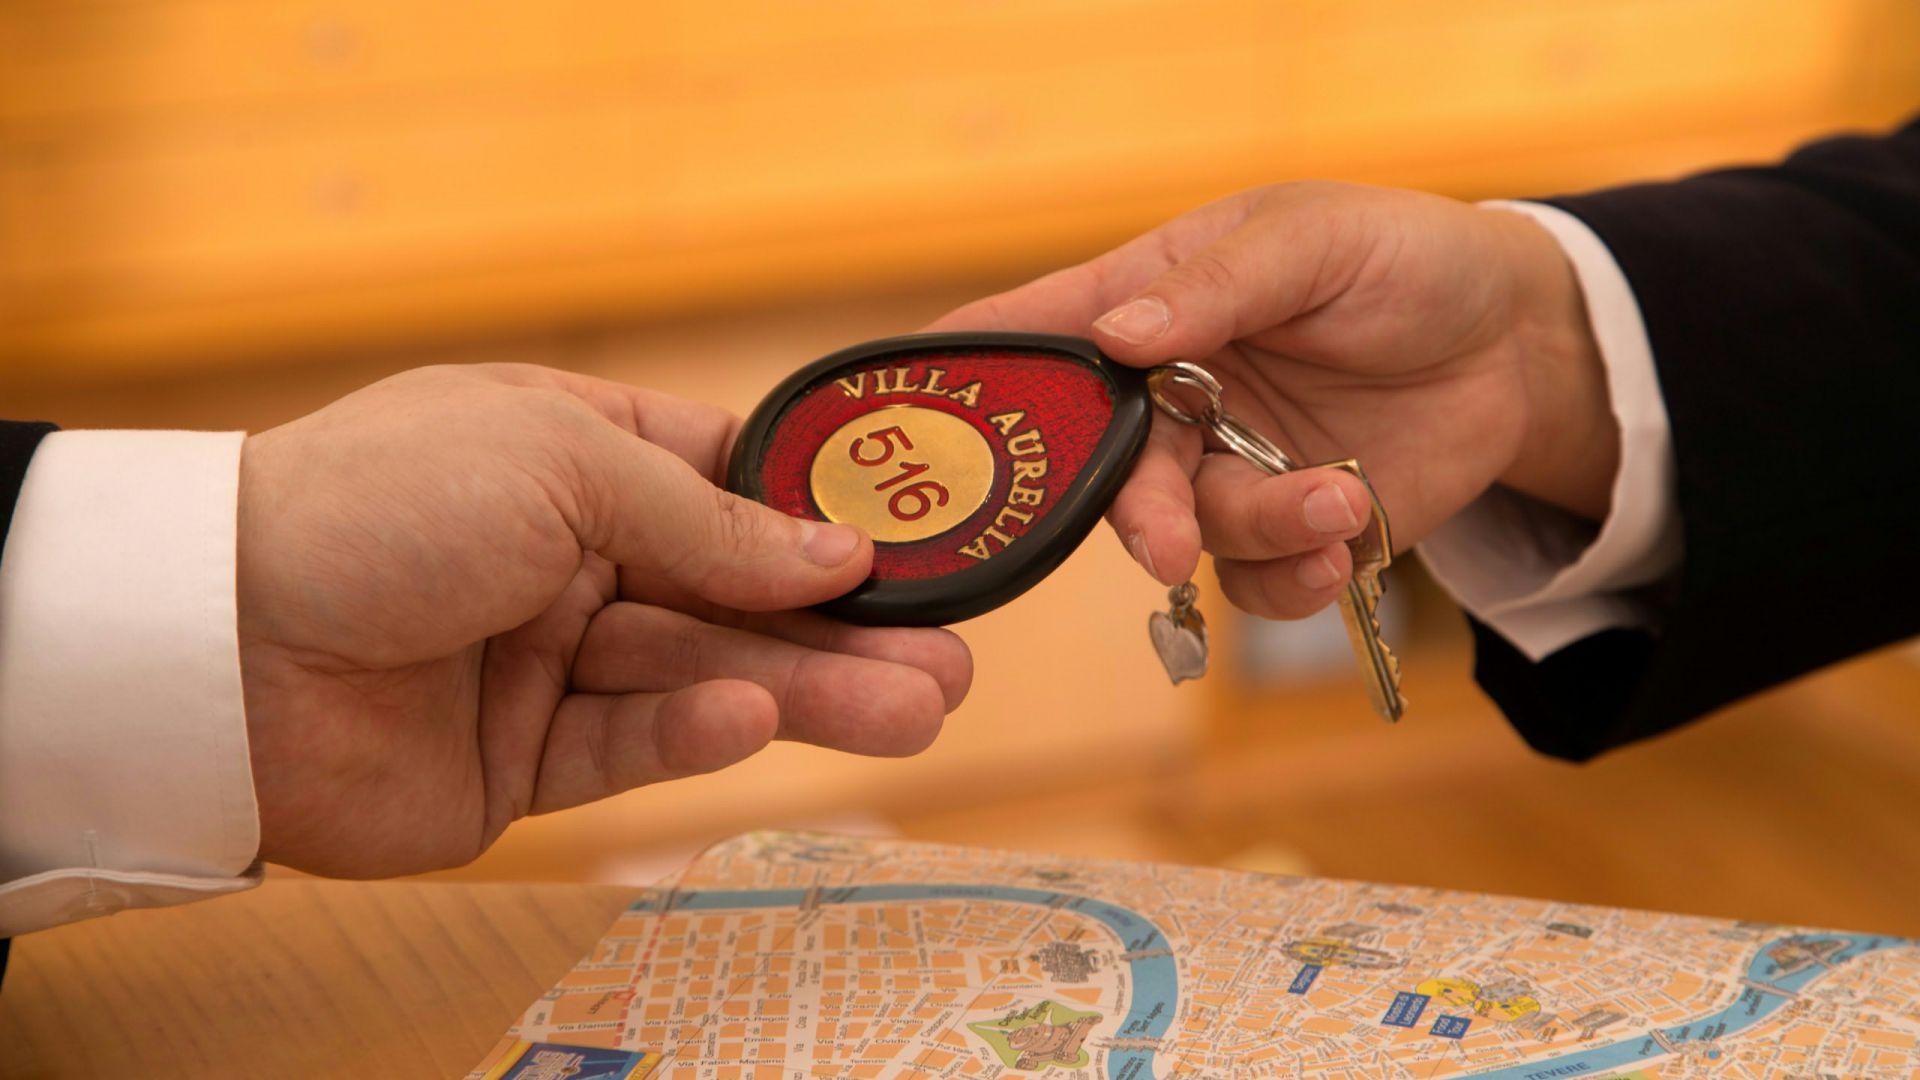 villa-aurelia-hotel-roma-chiave-01